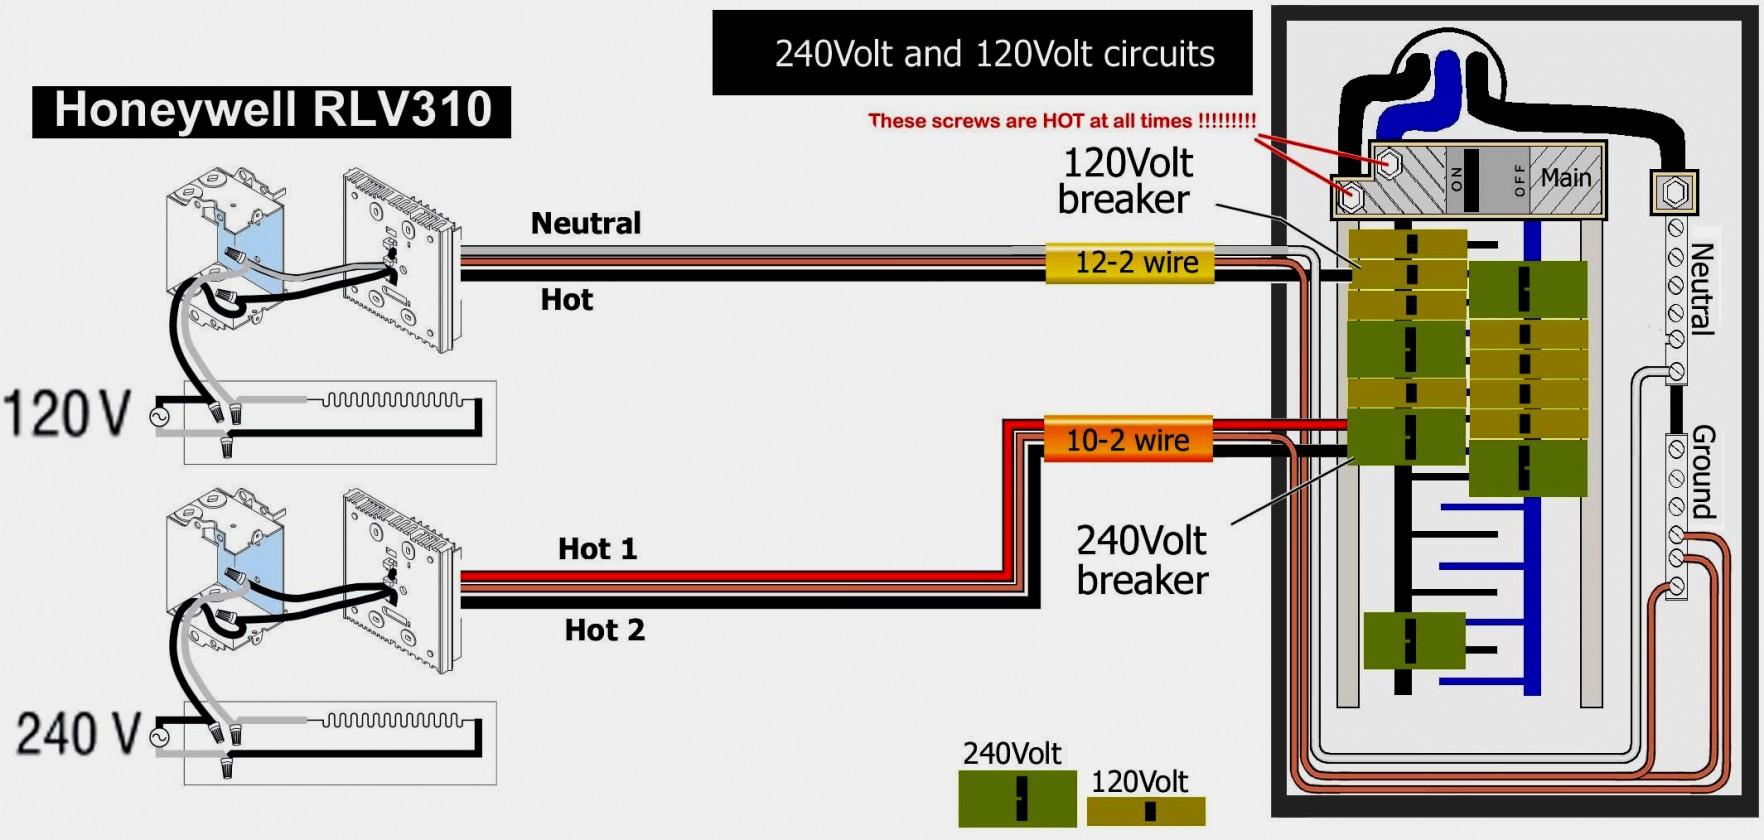 240V Heater Wiring Diagram | Wiring Diagram - 240 Volt Baseboard Heater Wiring Diagram